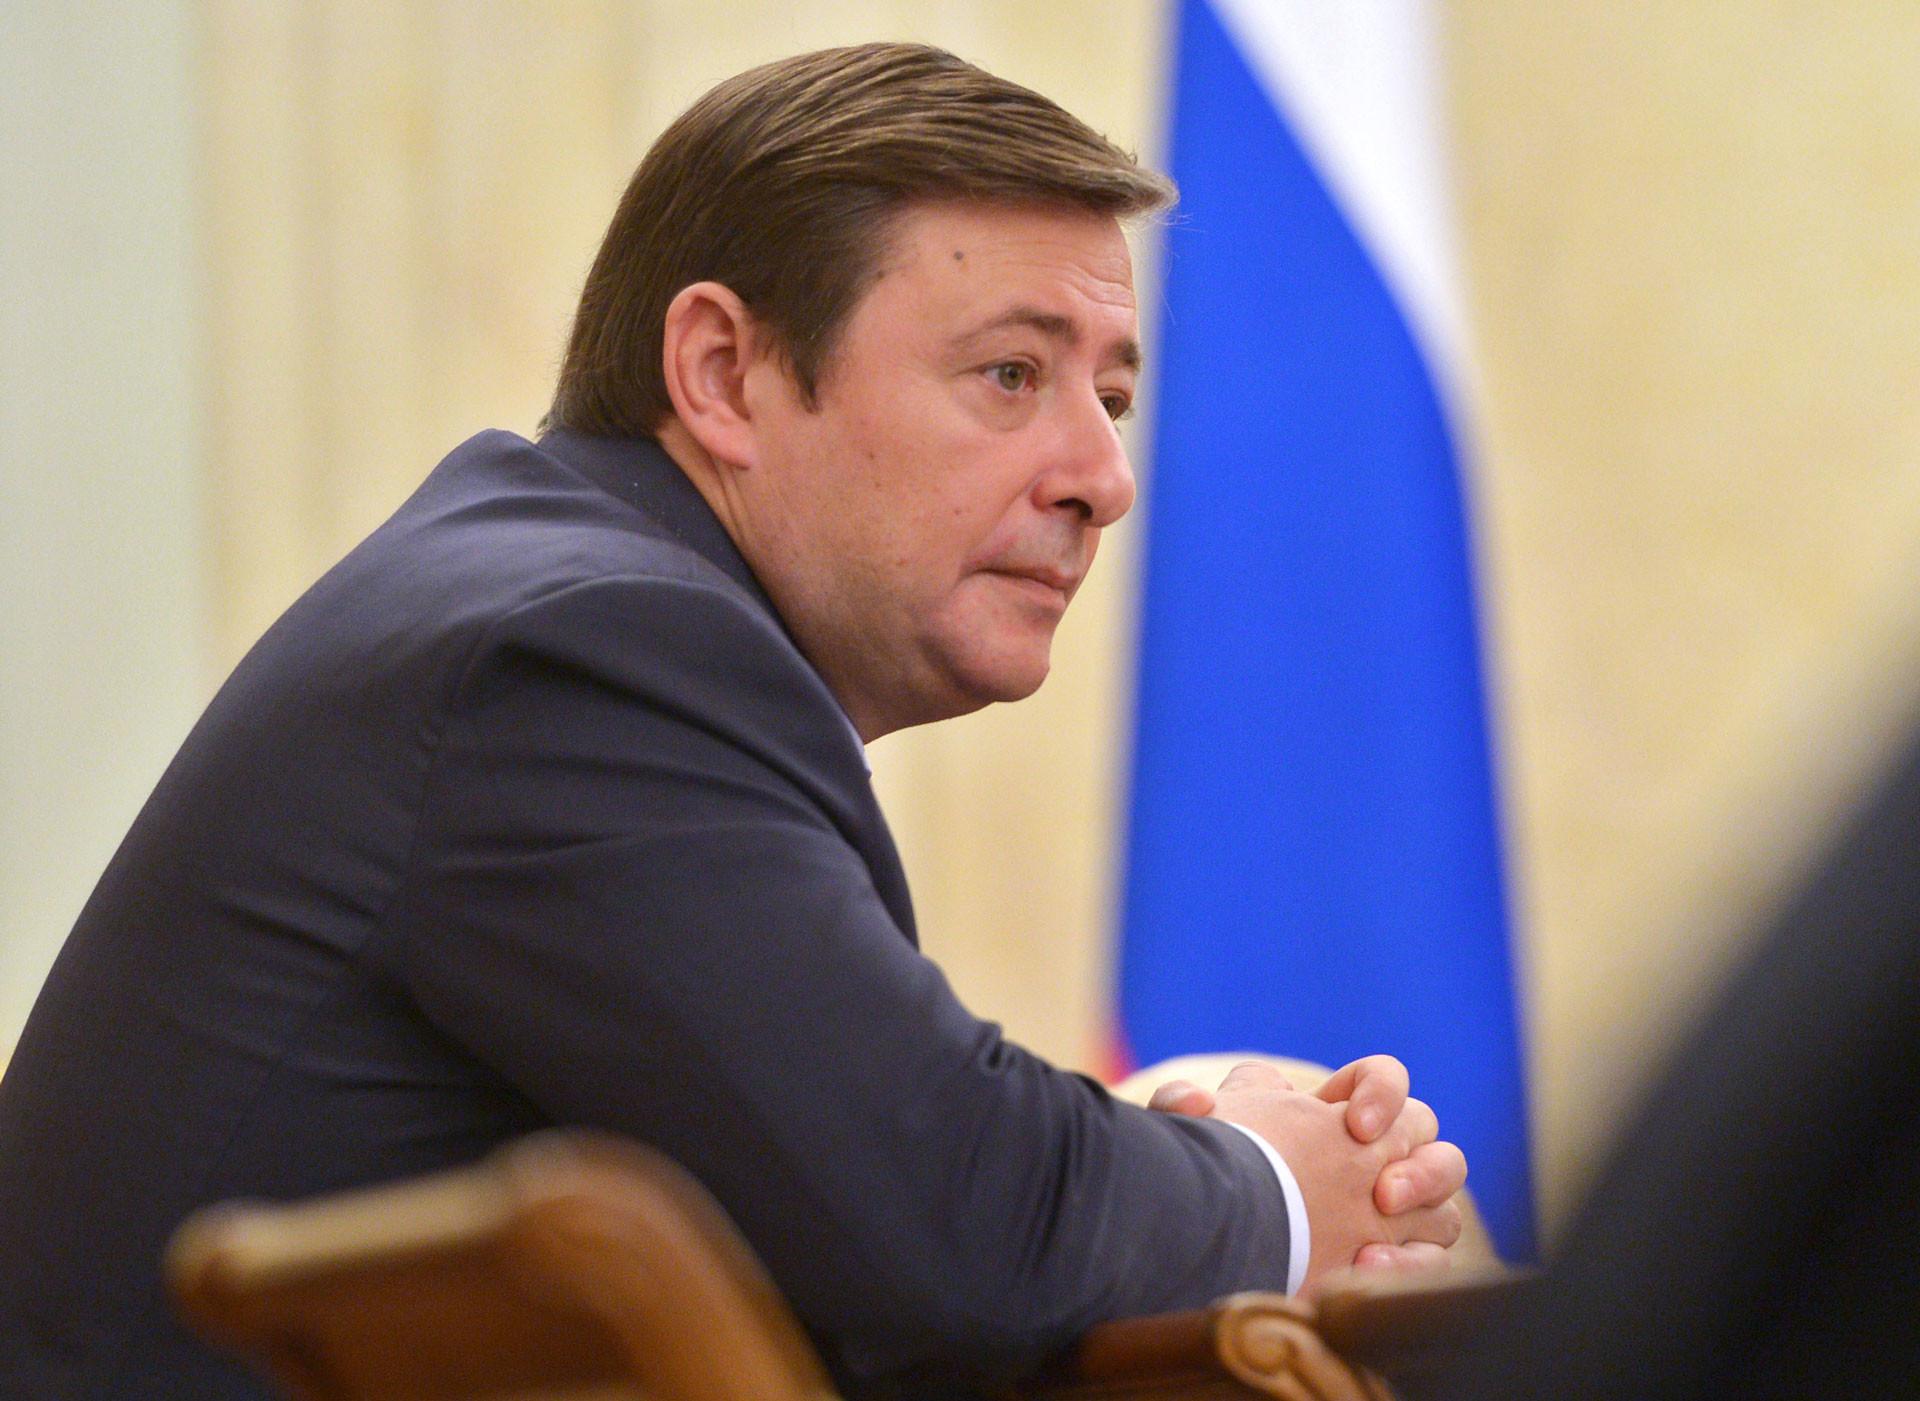 Фото: © РИА Новости/Александр Астафьев